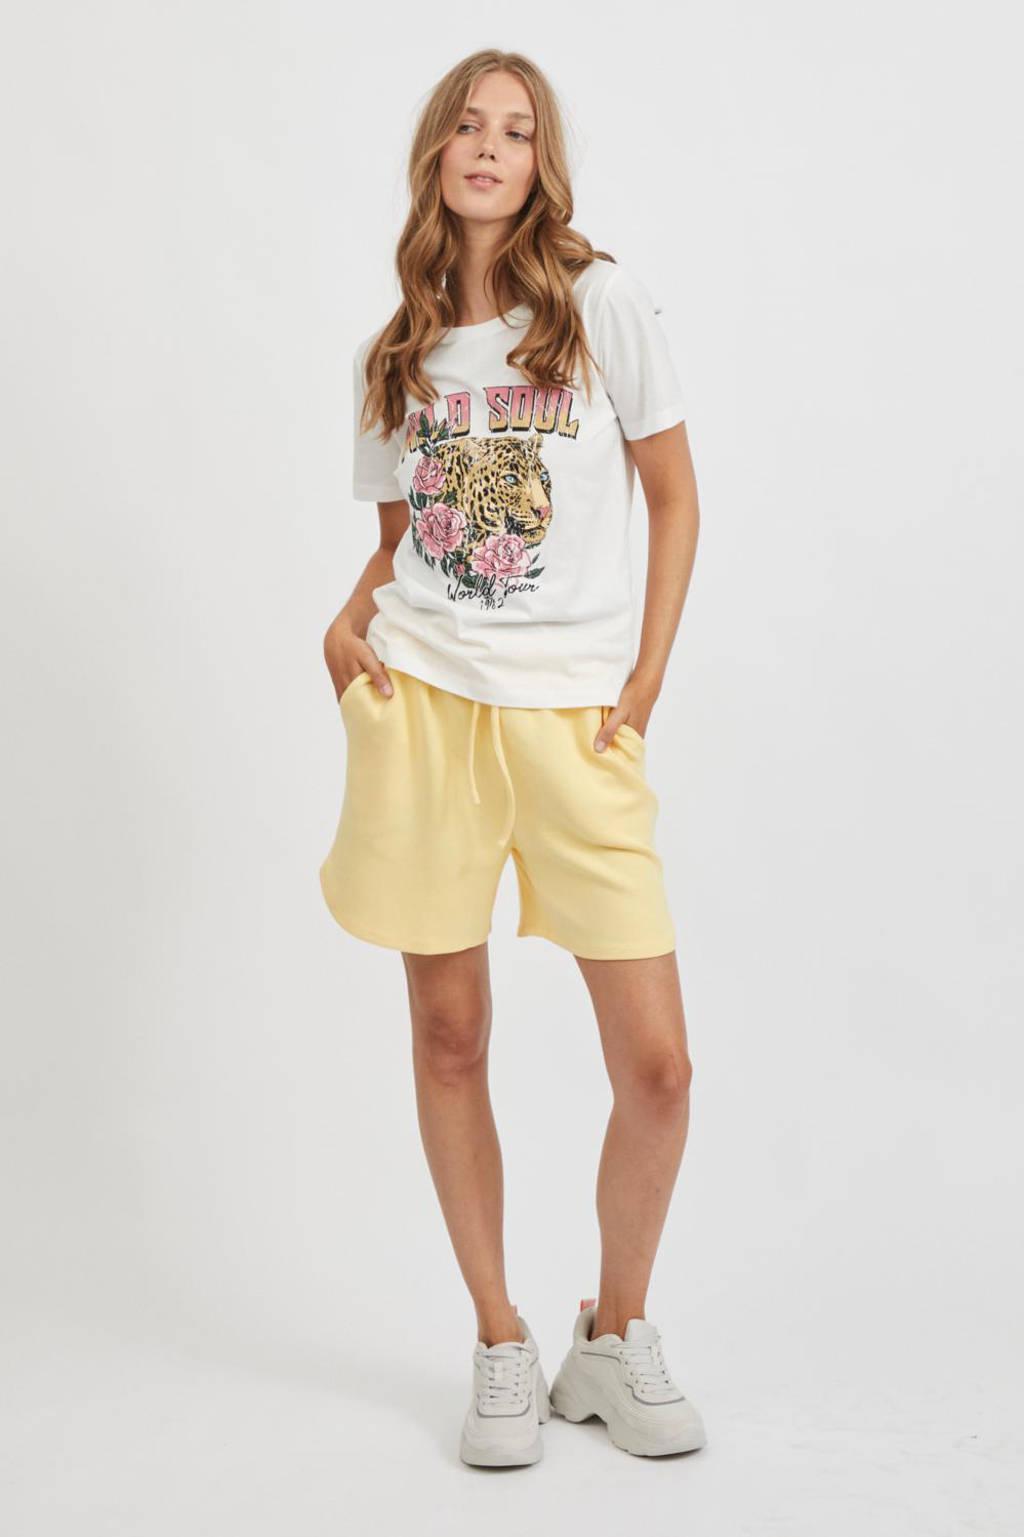 VILA T-shirt VIVULKAN T-SHIRT/KA met printopdruk wit, Wit